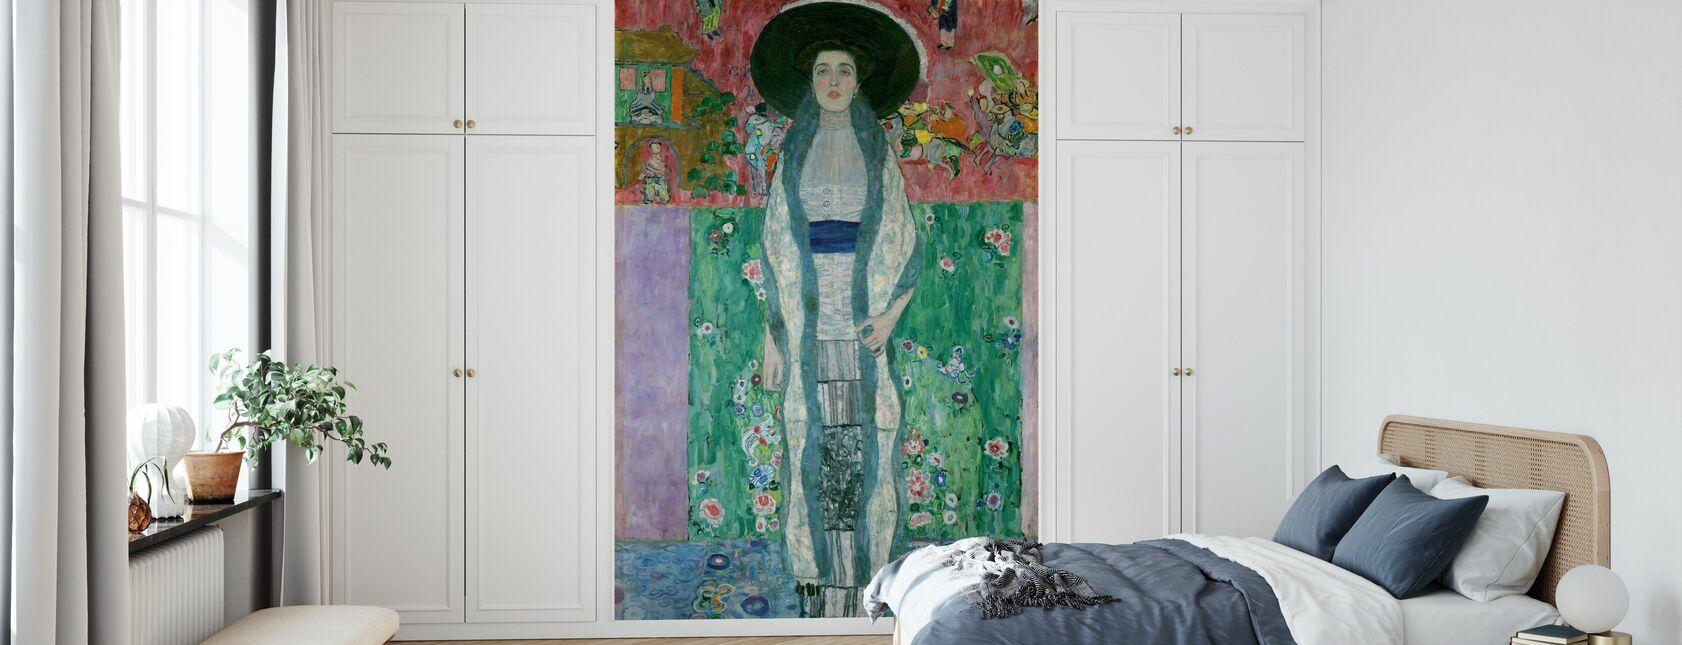 Portrait of Adele Bloch-Bauer - Gustav Klimt - Wallpaper - Bedroom